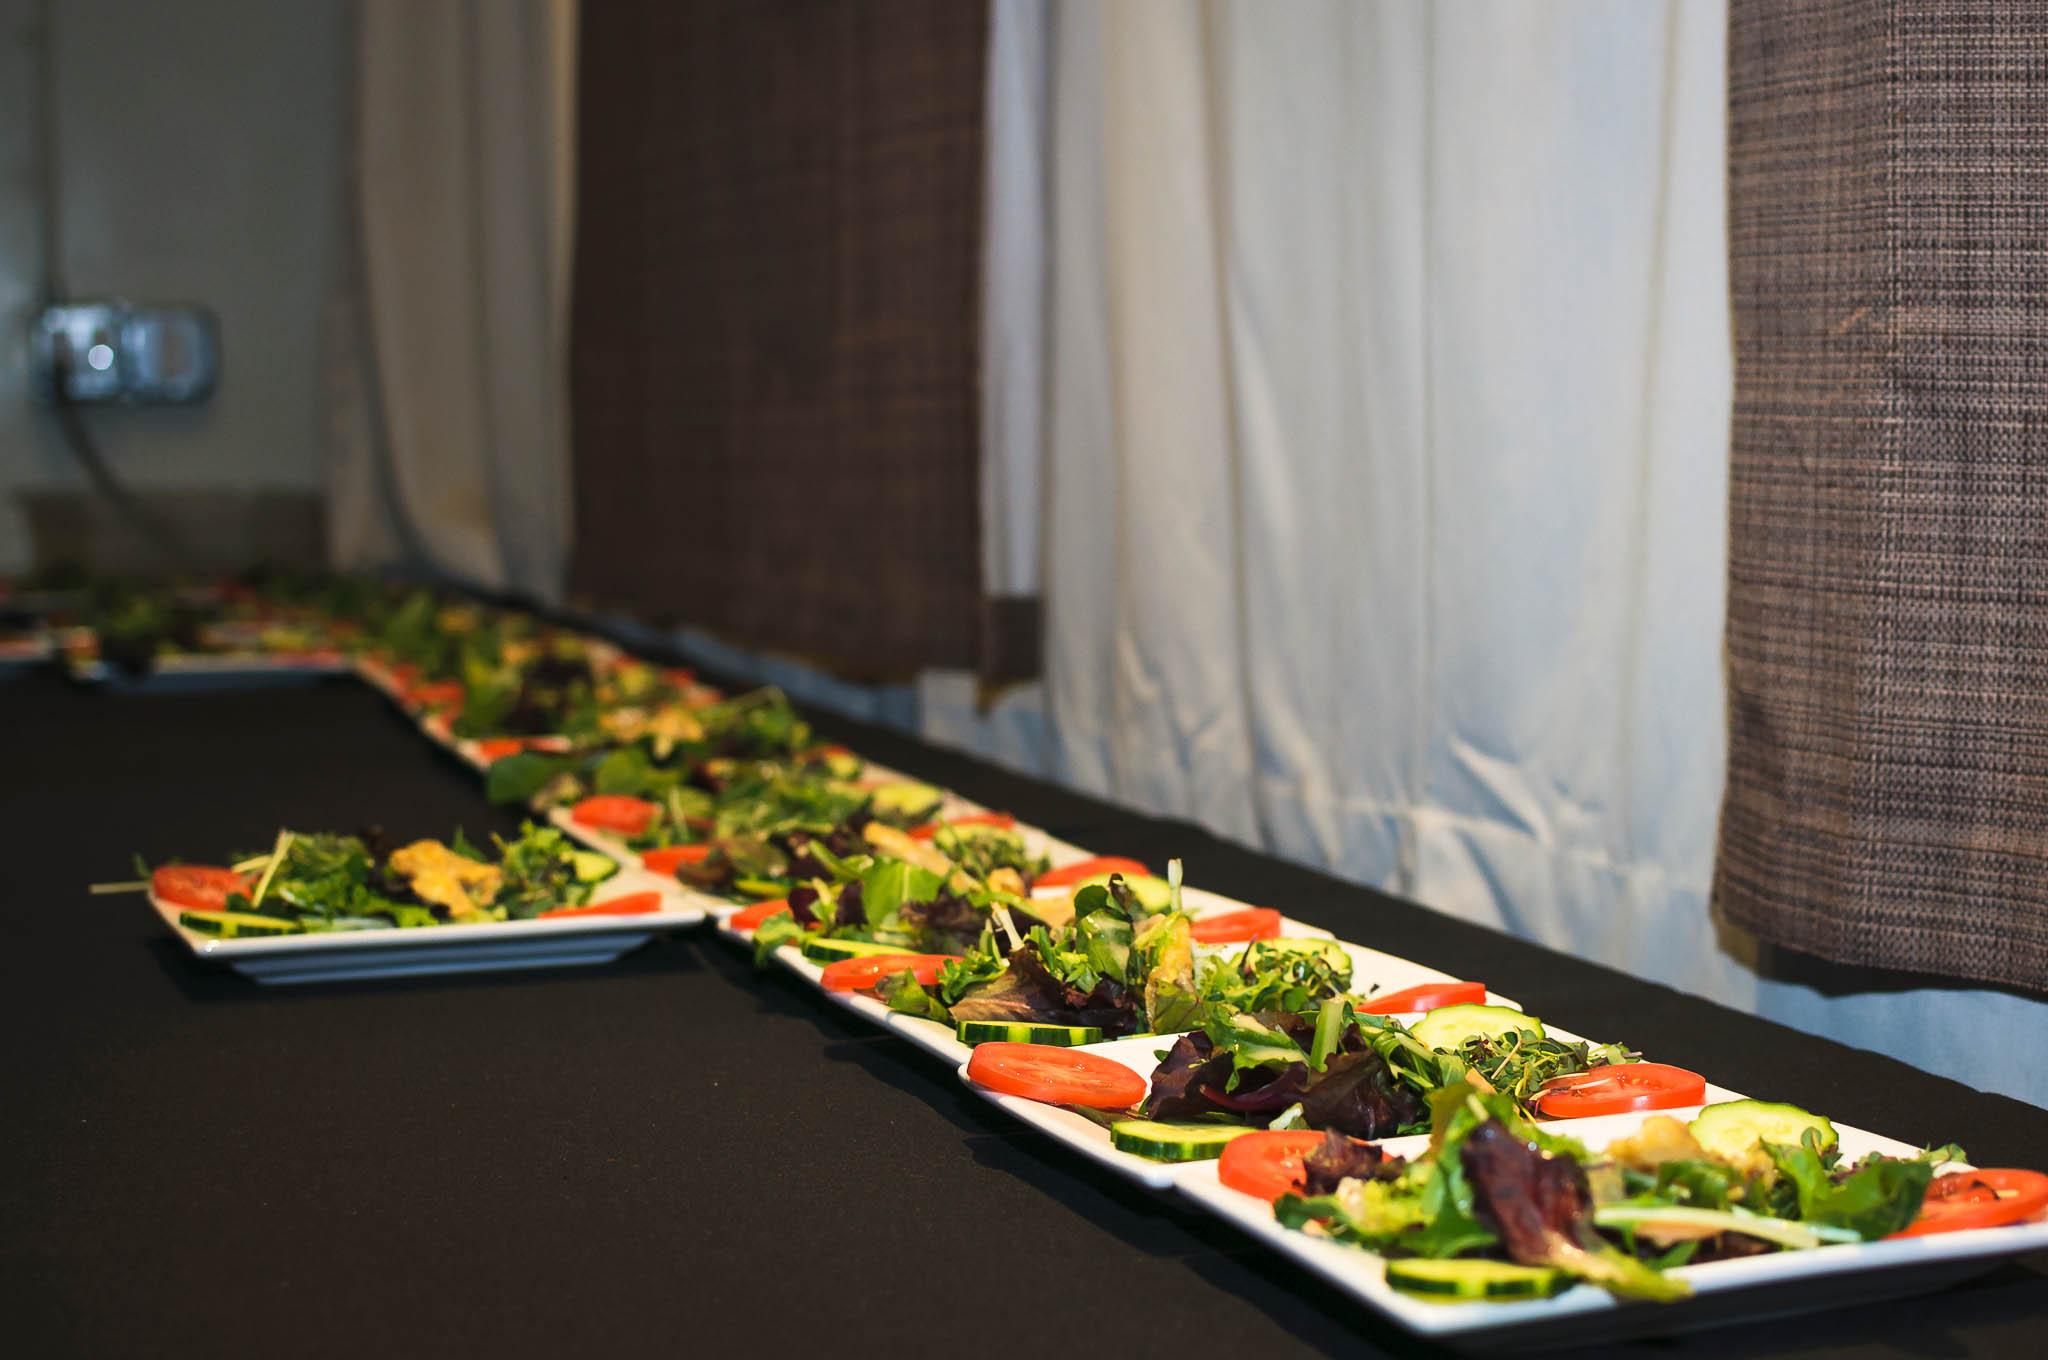 Plates of abalone salad.